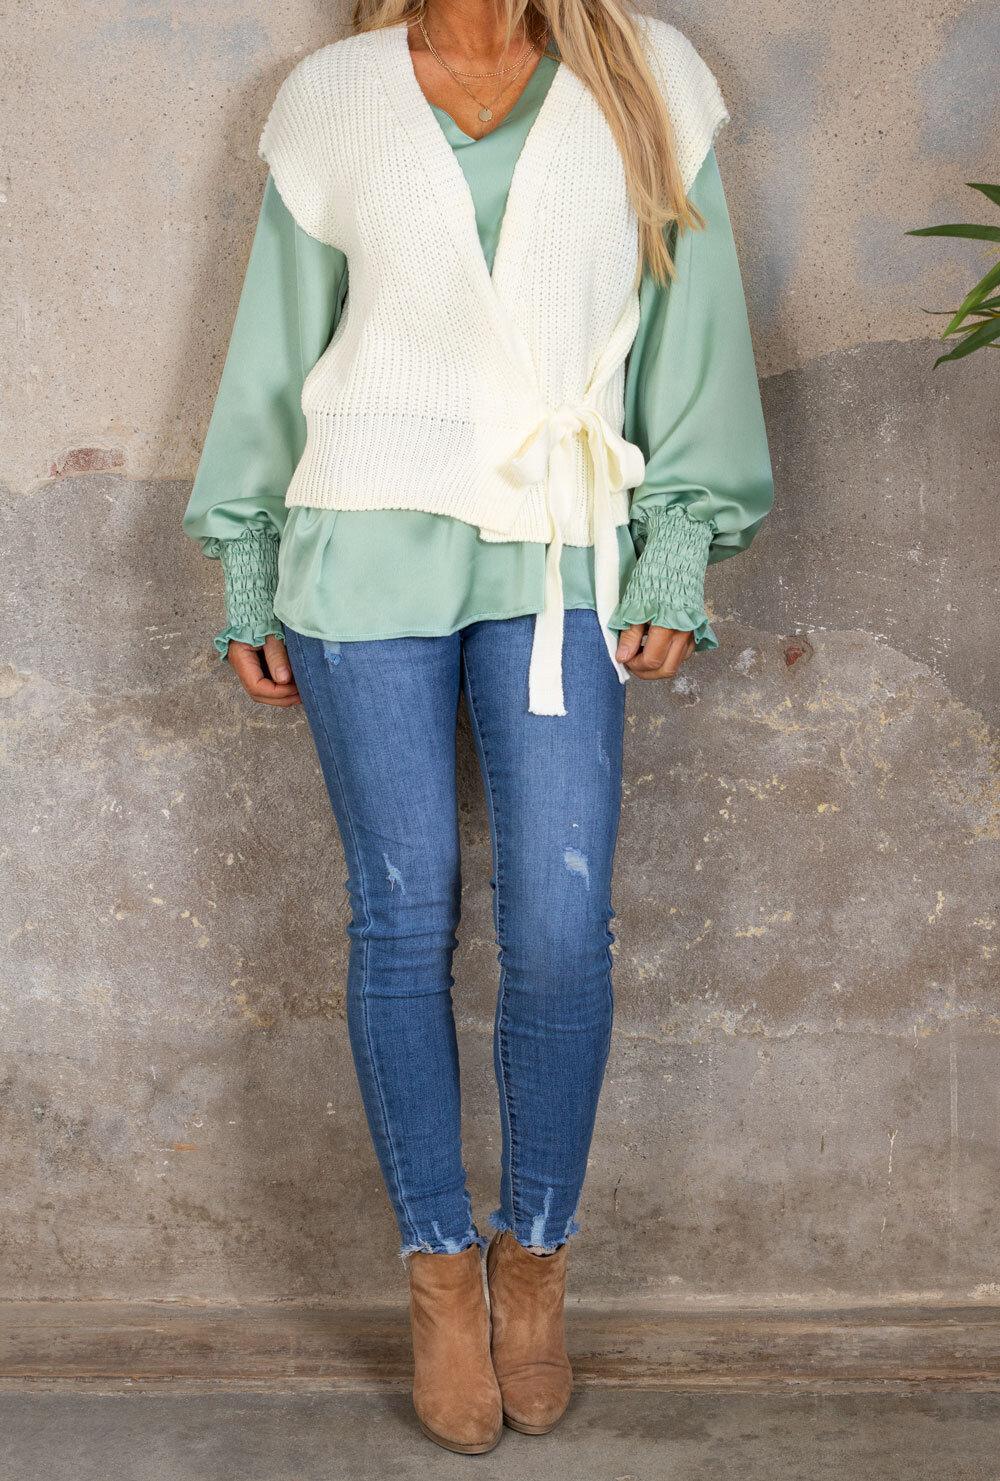 Kendra Knitted vest - Tie - Cream